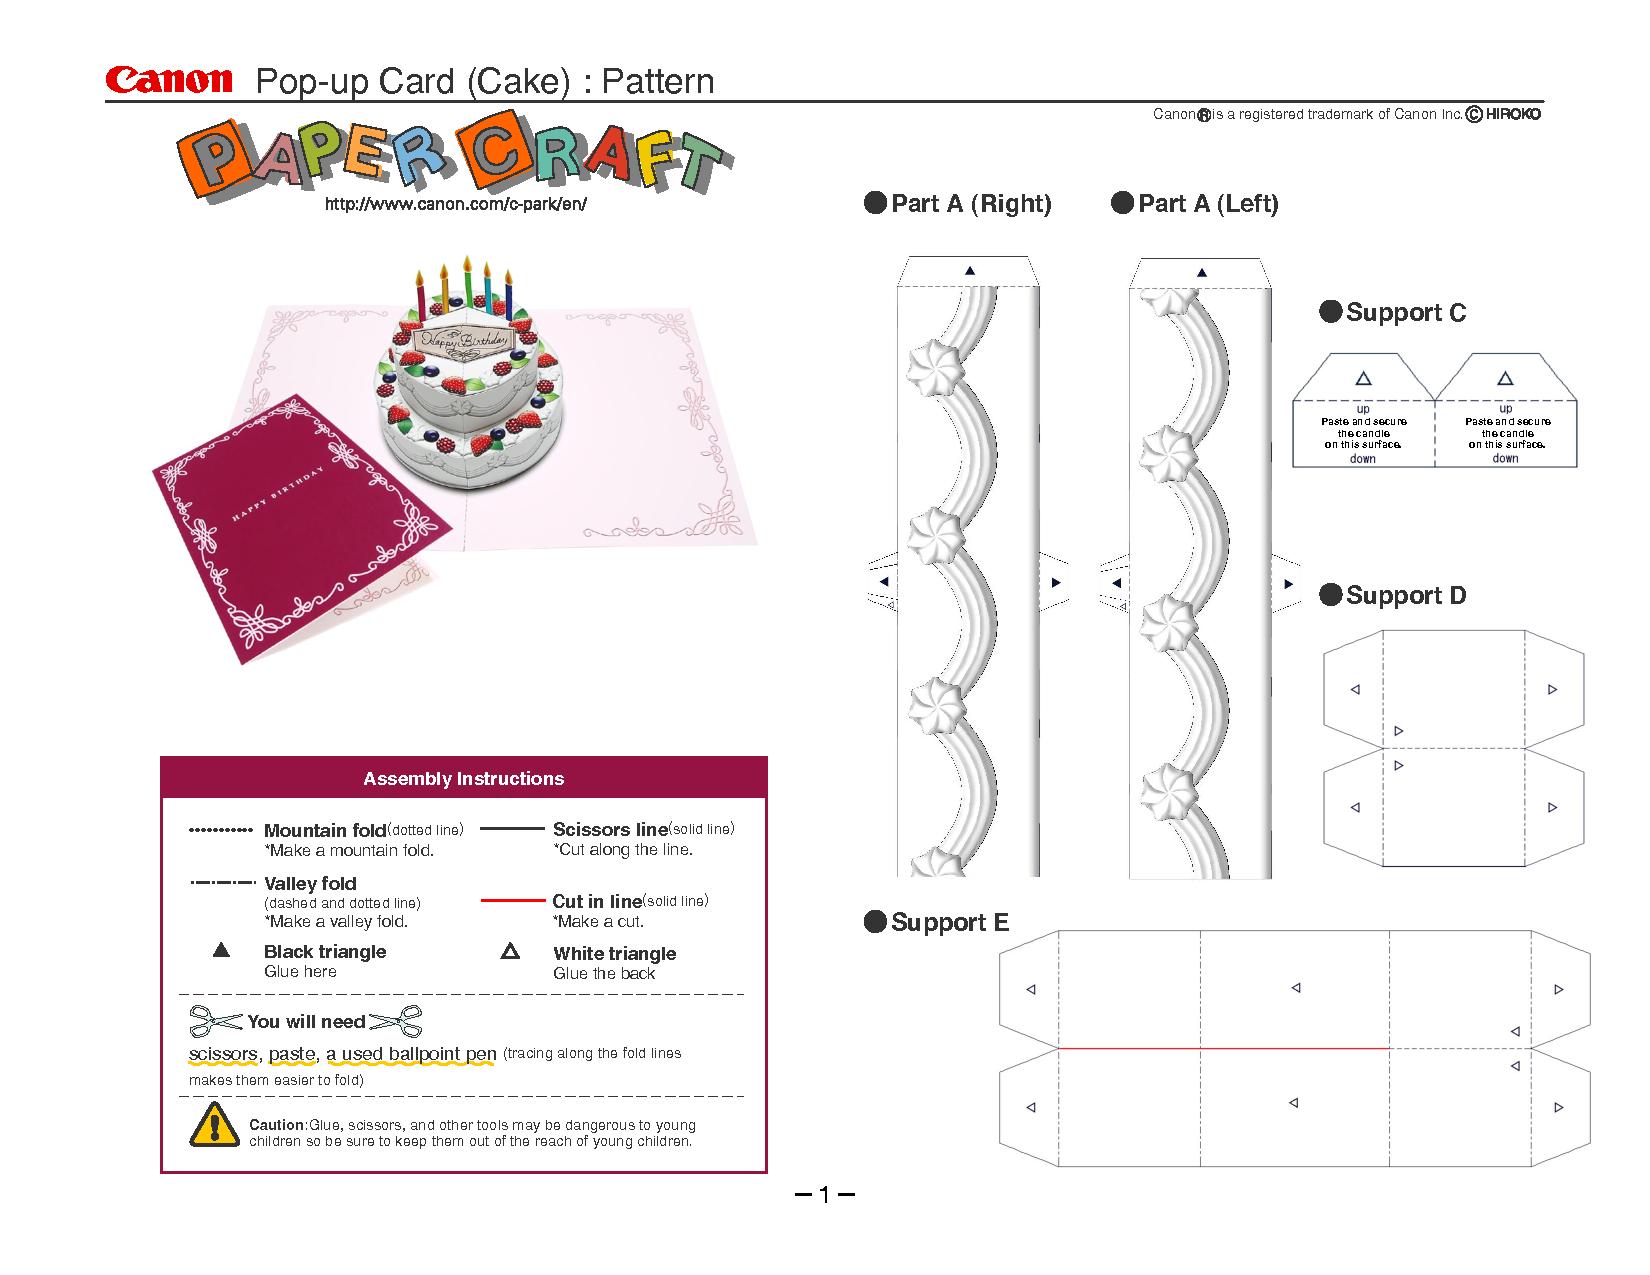 Birthday Cake Pop Up Card Template | Pop Up Card Templates In Printable Pop Up Card Templates Free